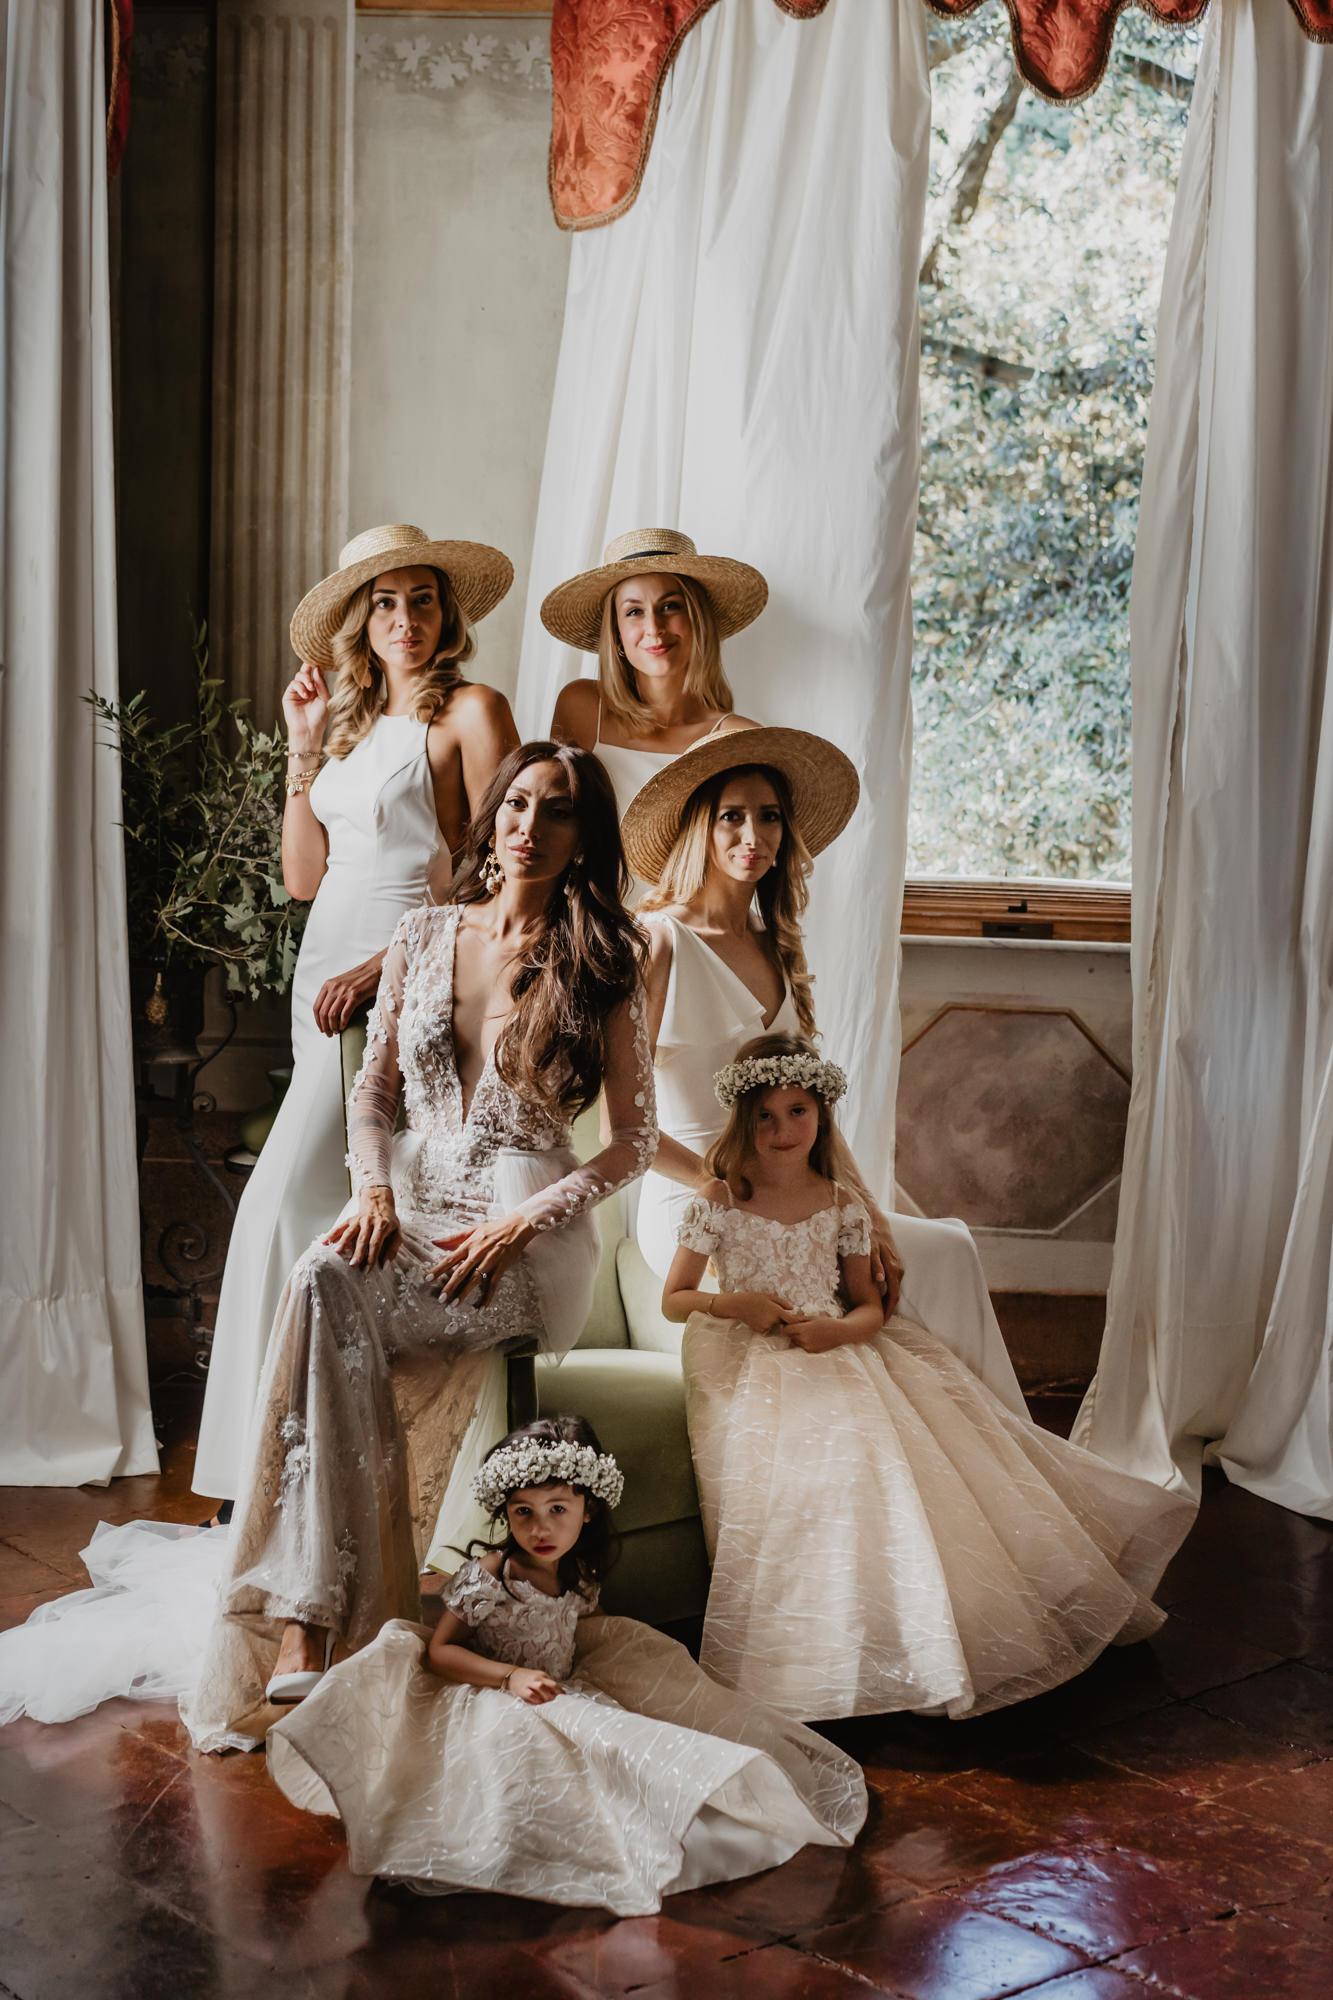 Elegant bridal party attire - photo by David Bastianoni